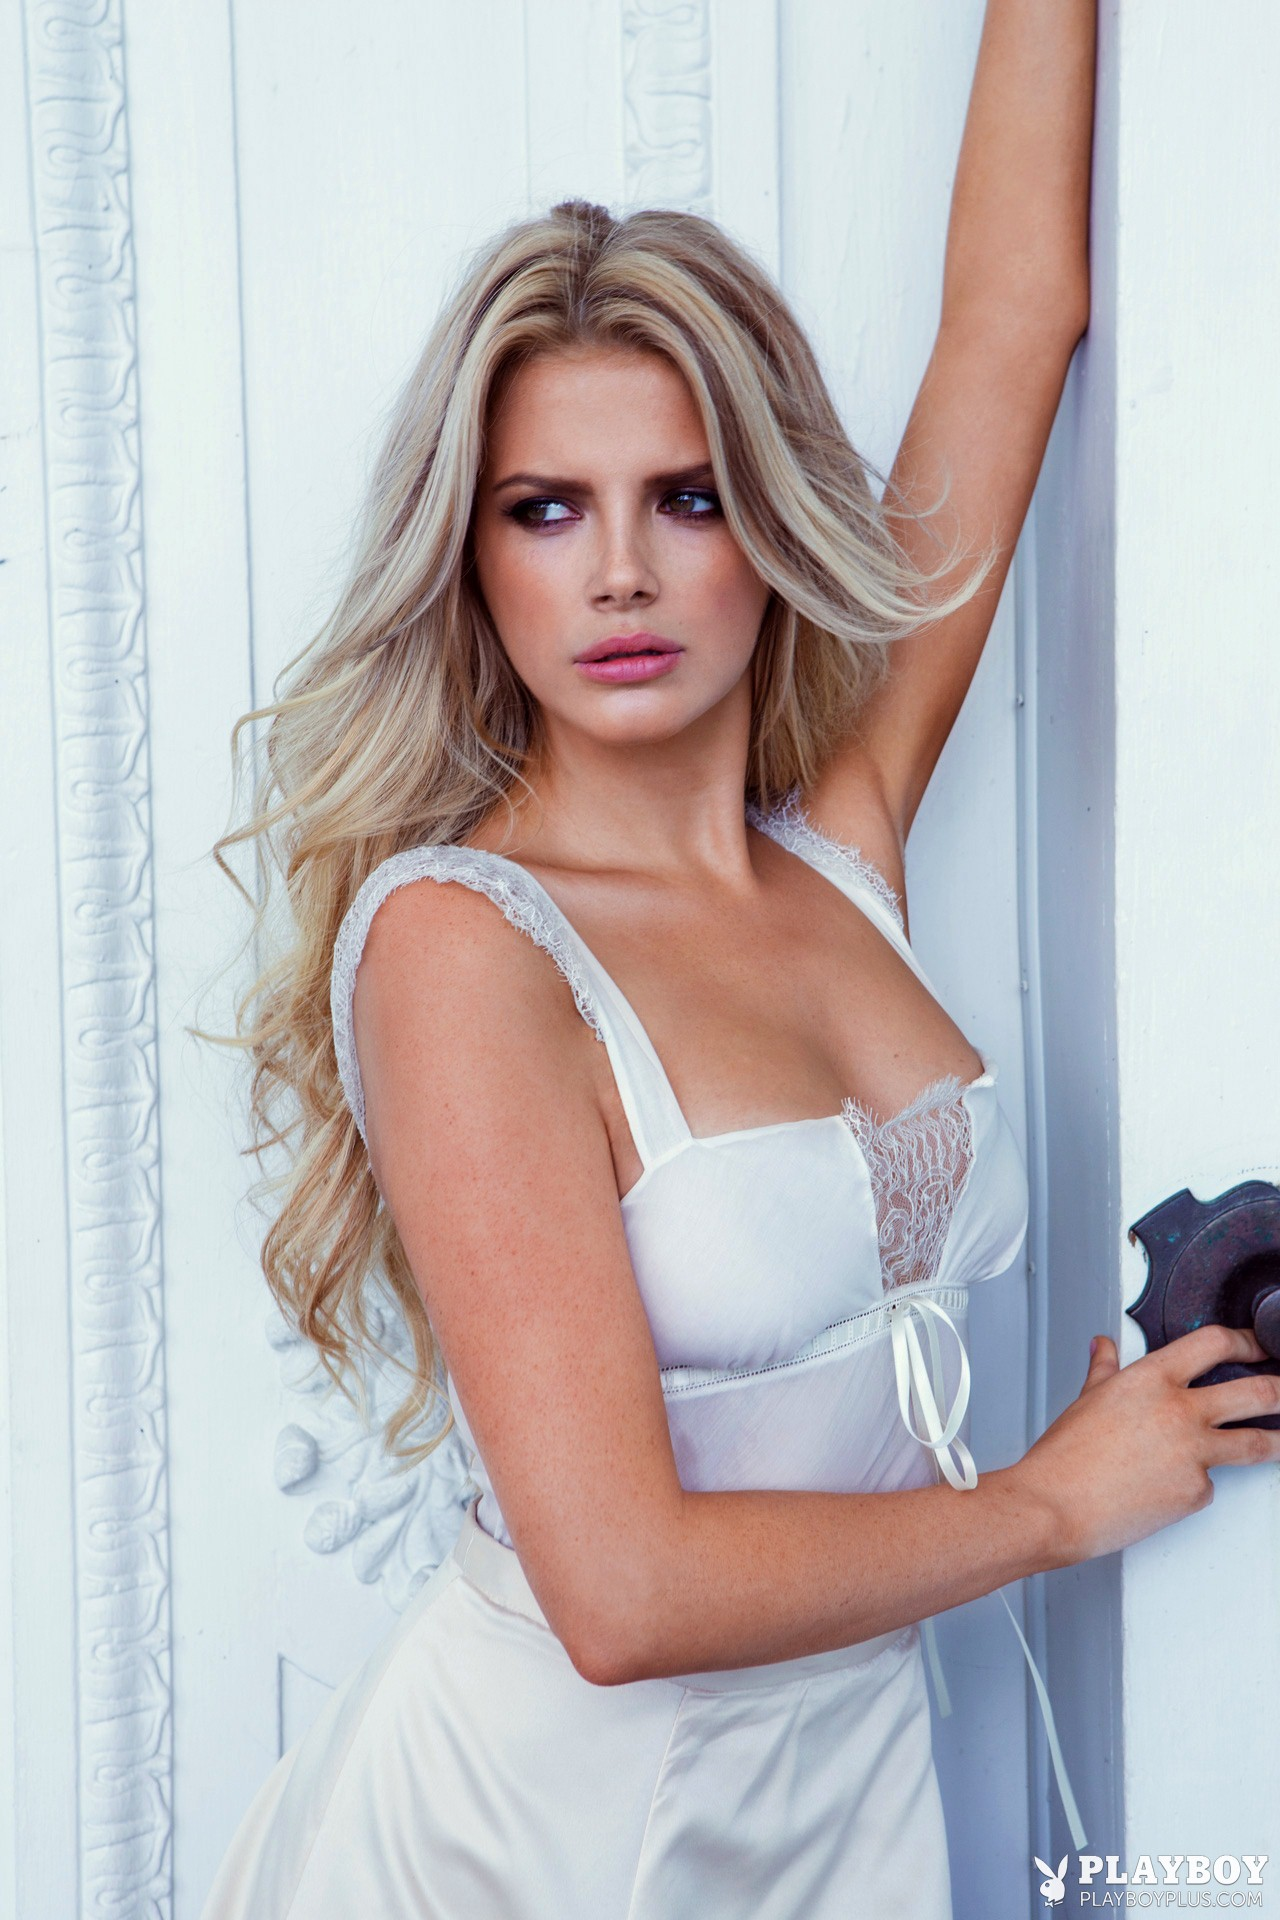 Stephanie Branton Playboy directors choice